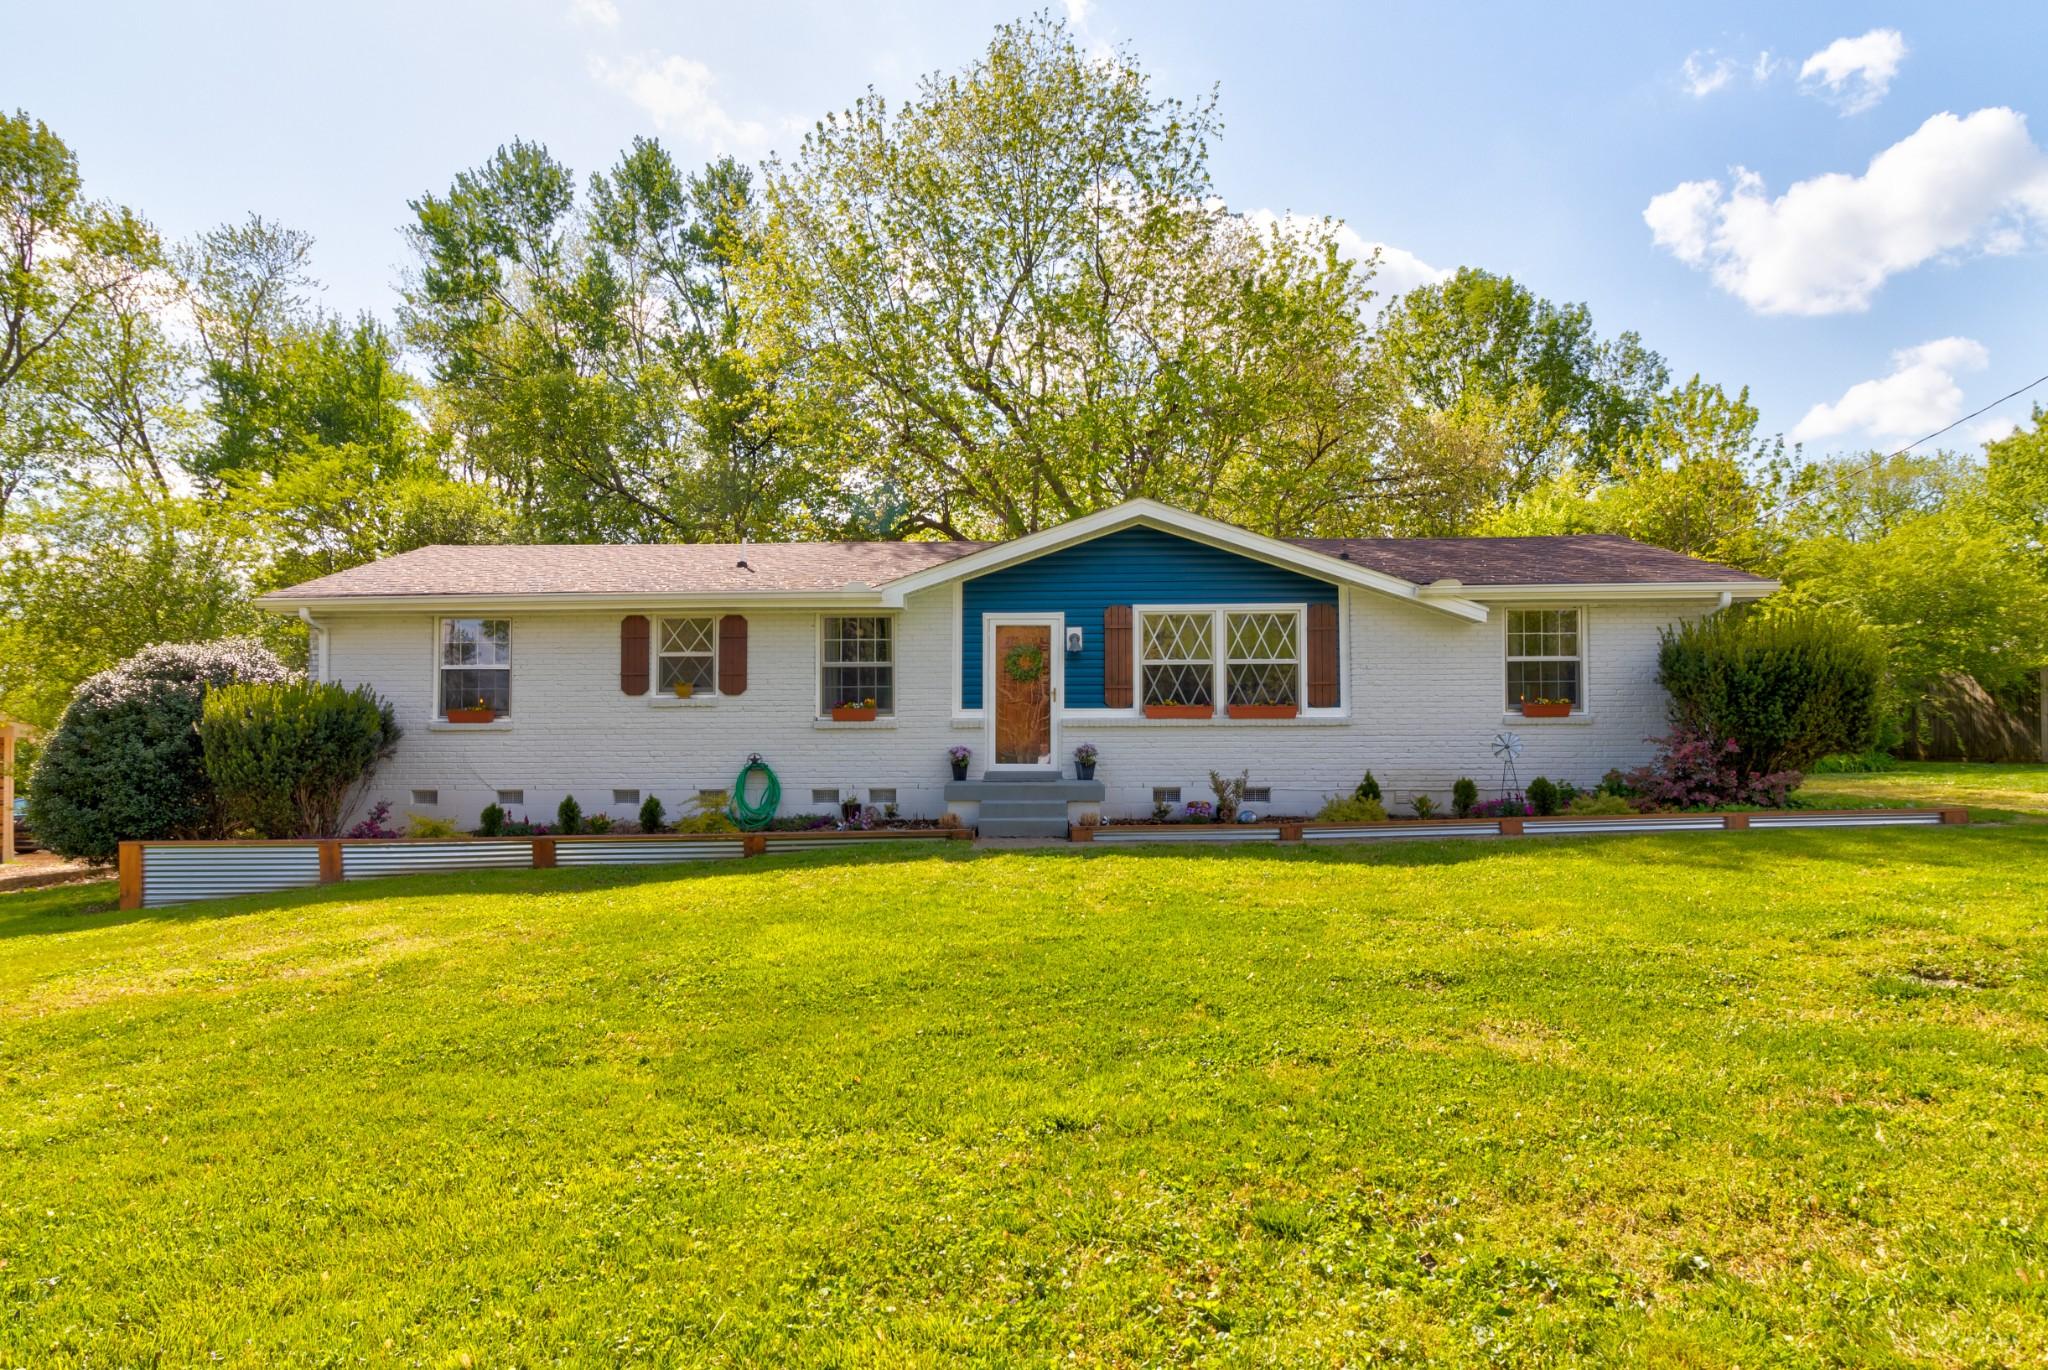 115 Keystone Ln Property Photo - Hendersonville, TN real estate listing